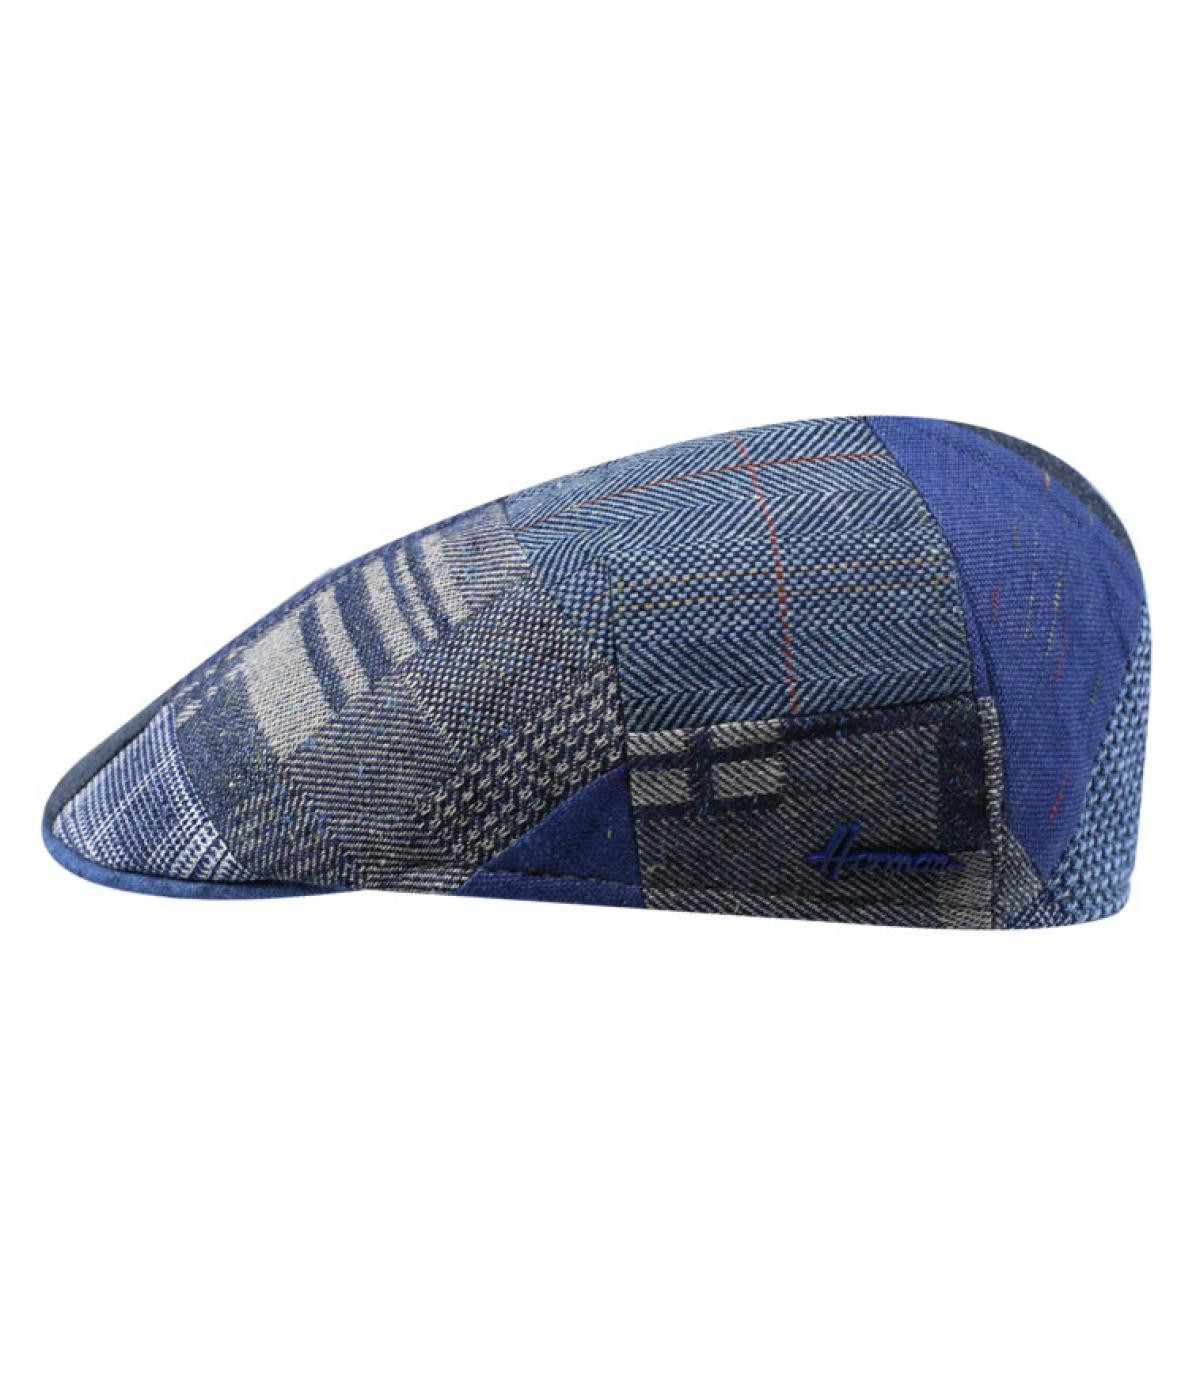 Details Boxer Patch blue - Abbildung 2